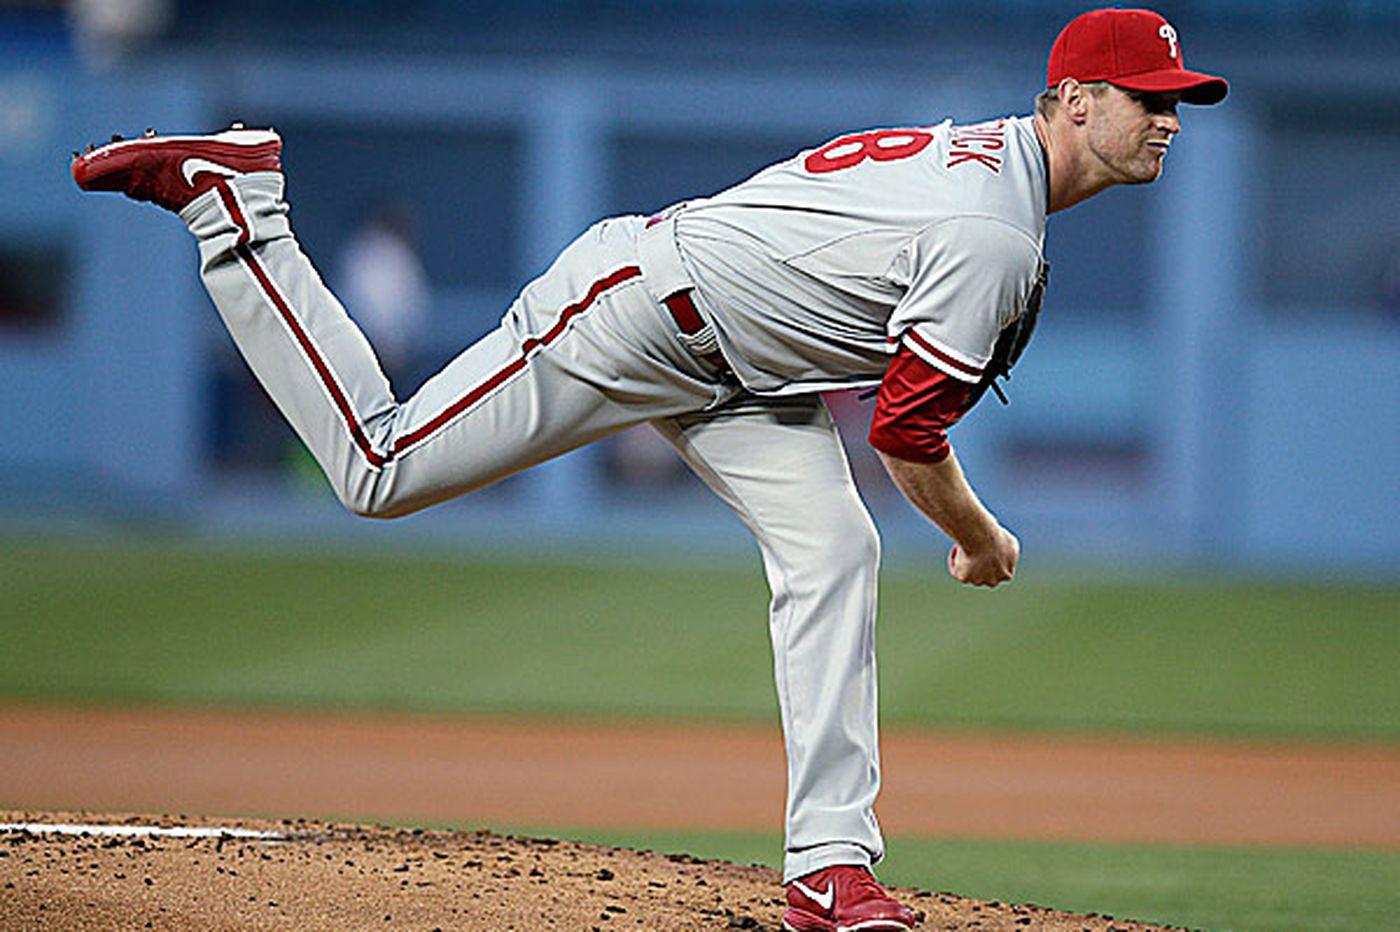 Phillies shuffle rotation after rainout